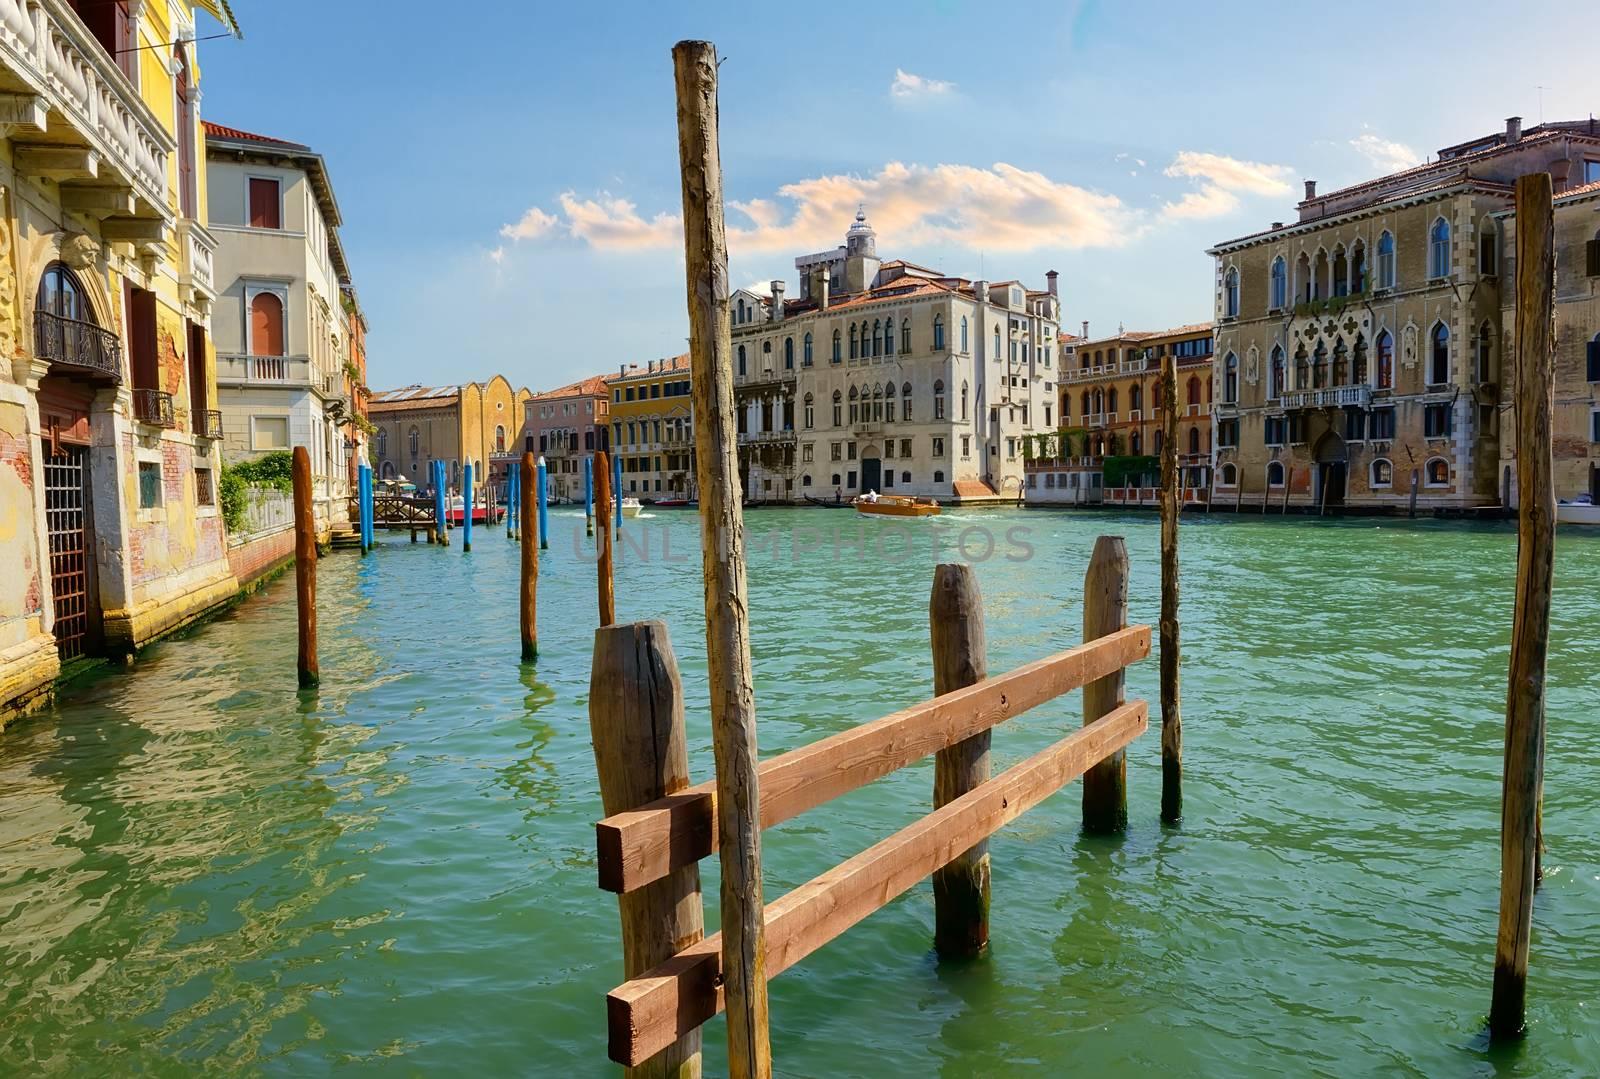 Sunny summer day in romantic Venice, Italy